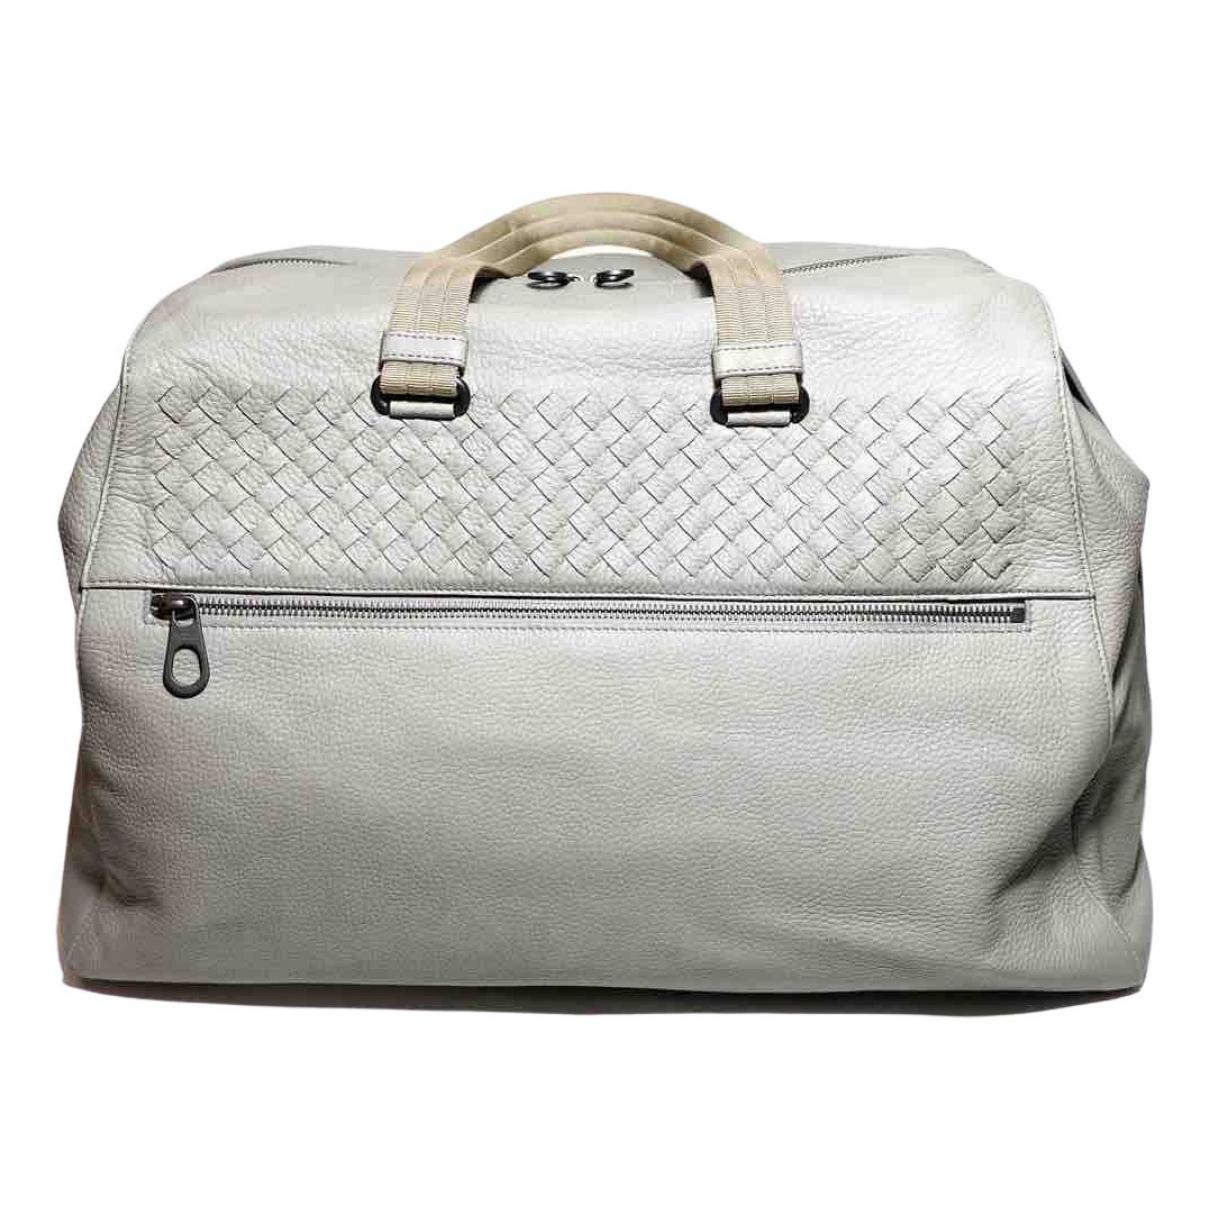 Bottega Veneta \N Grey Leather bag for Men \N